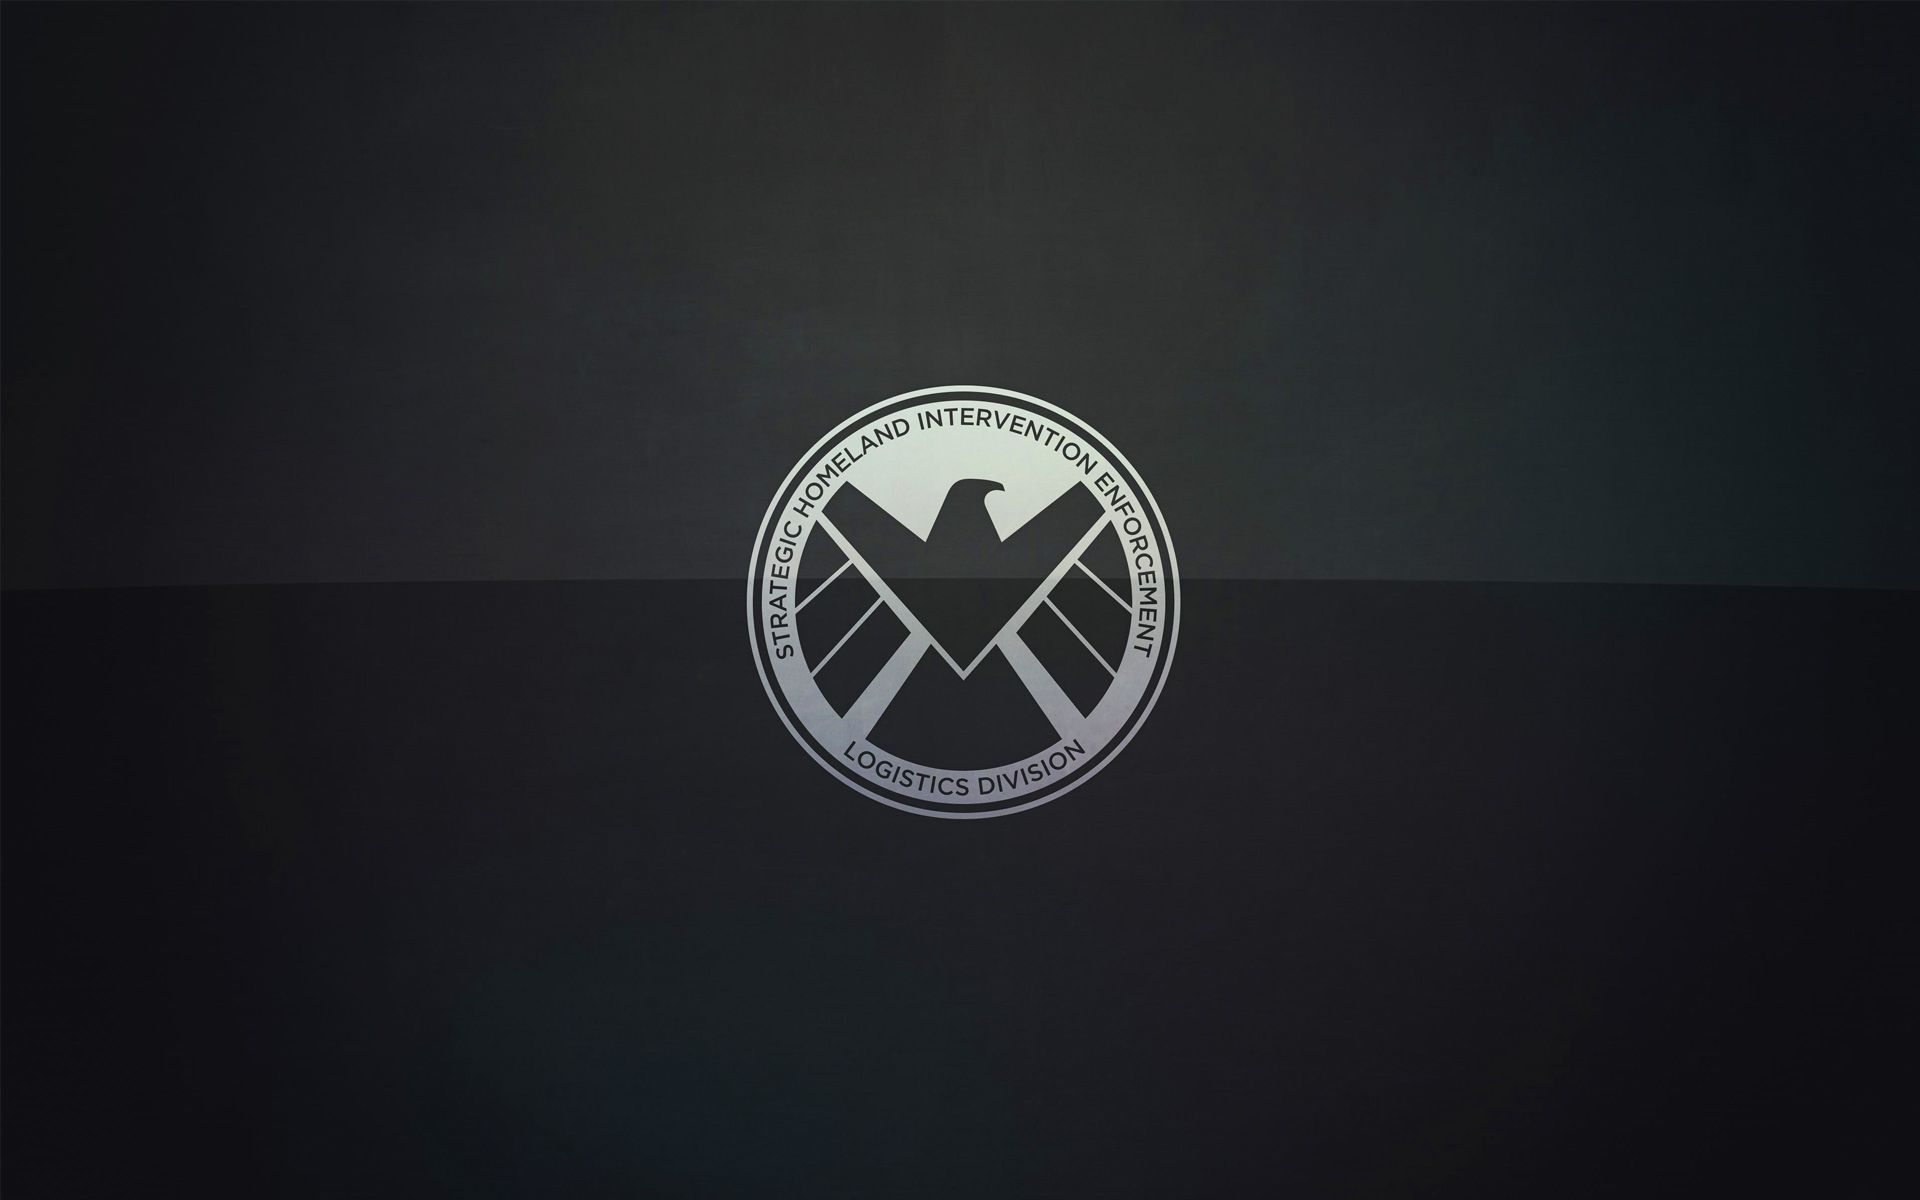 Shield Desktop Wallpapers Top Free Shield Desktop Backgrounds